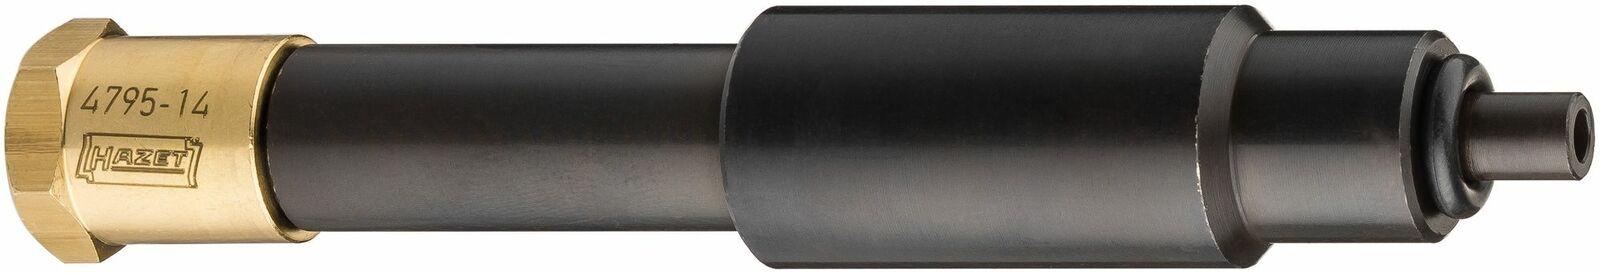 HAZET Engine leakage tester 4795-14